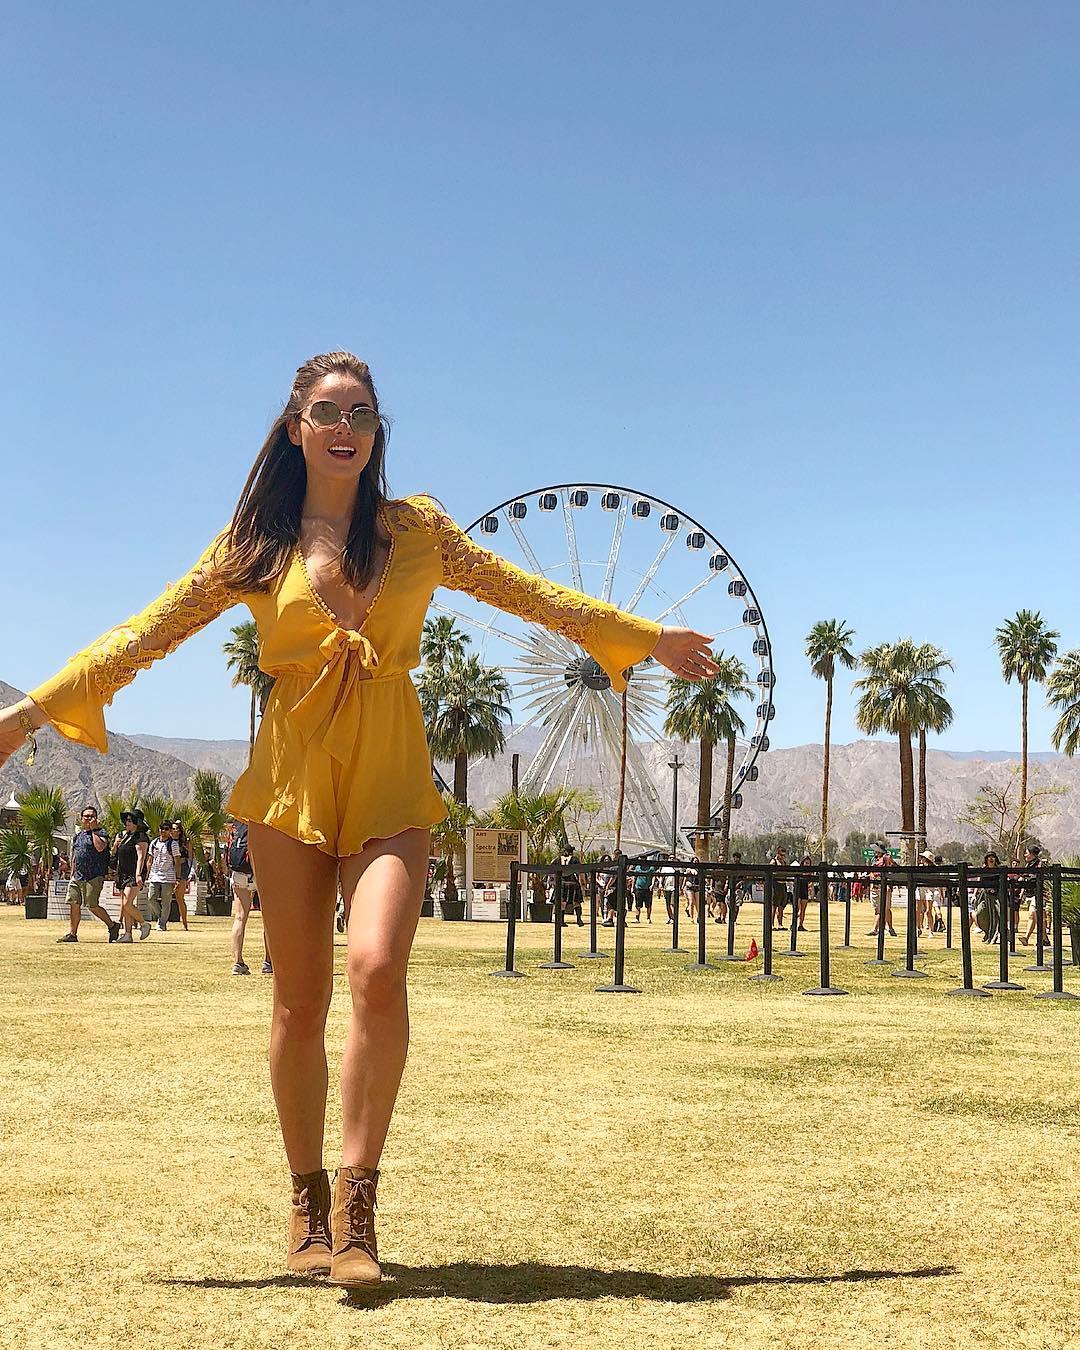 marisa butler, top 30 de miss world 2018/miss earth maine 2020. - Página 2 30087312